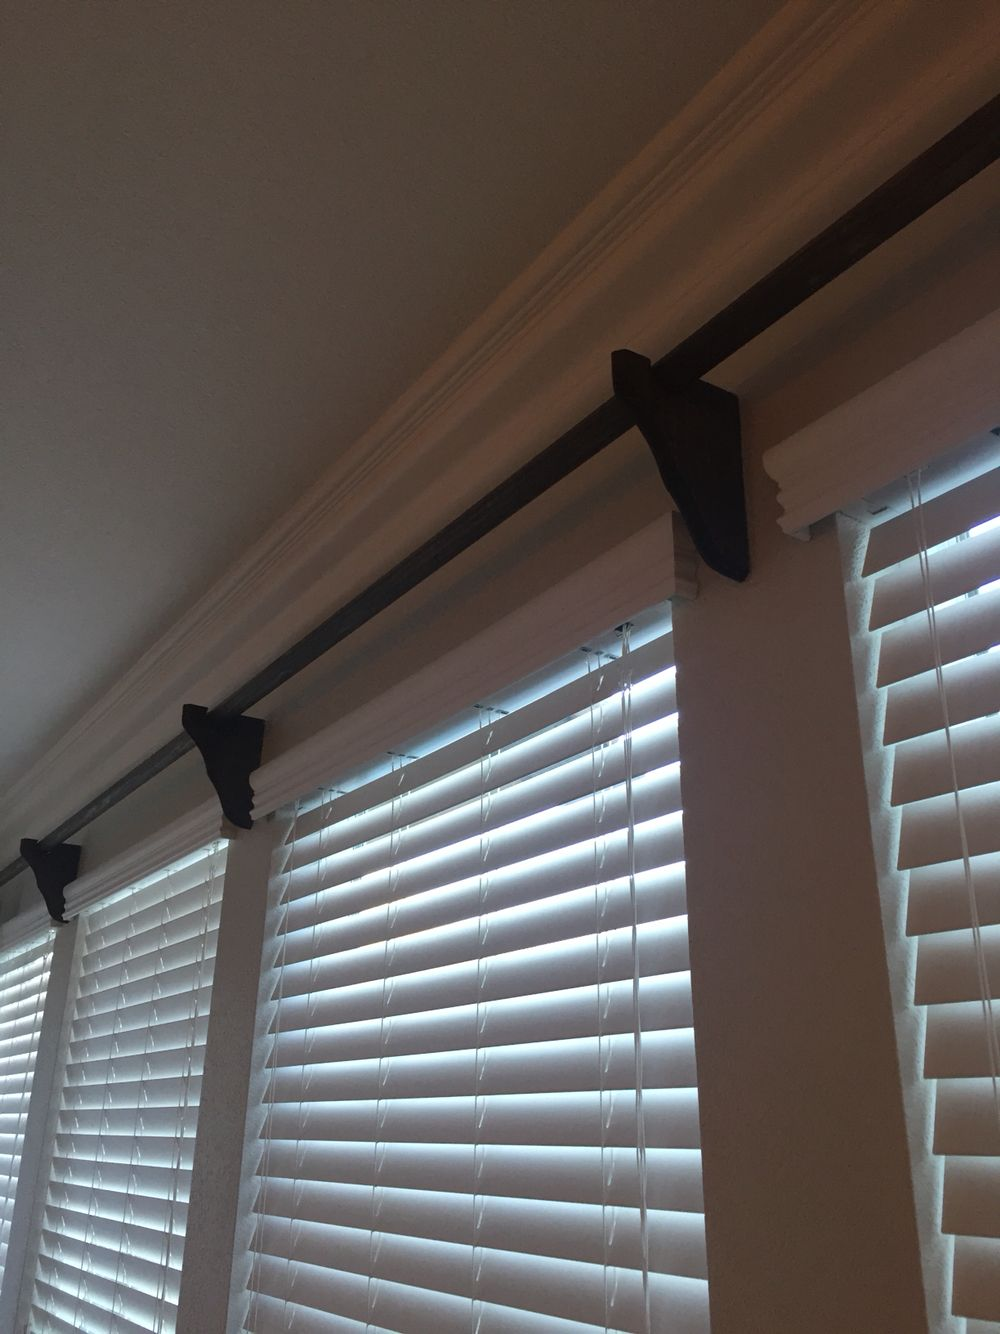 Homemade Curtain Rod Homemade Curtain Rods Homemade Curtains